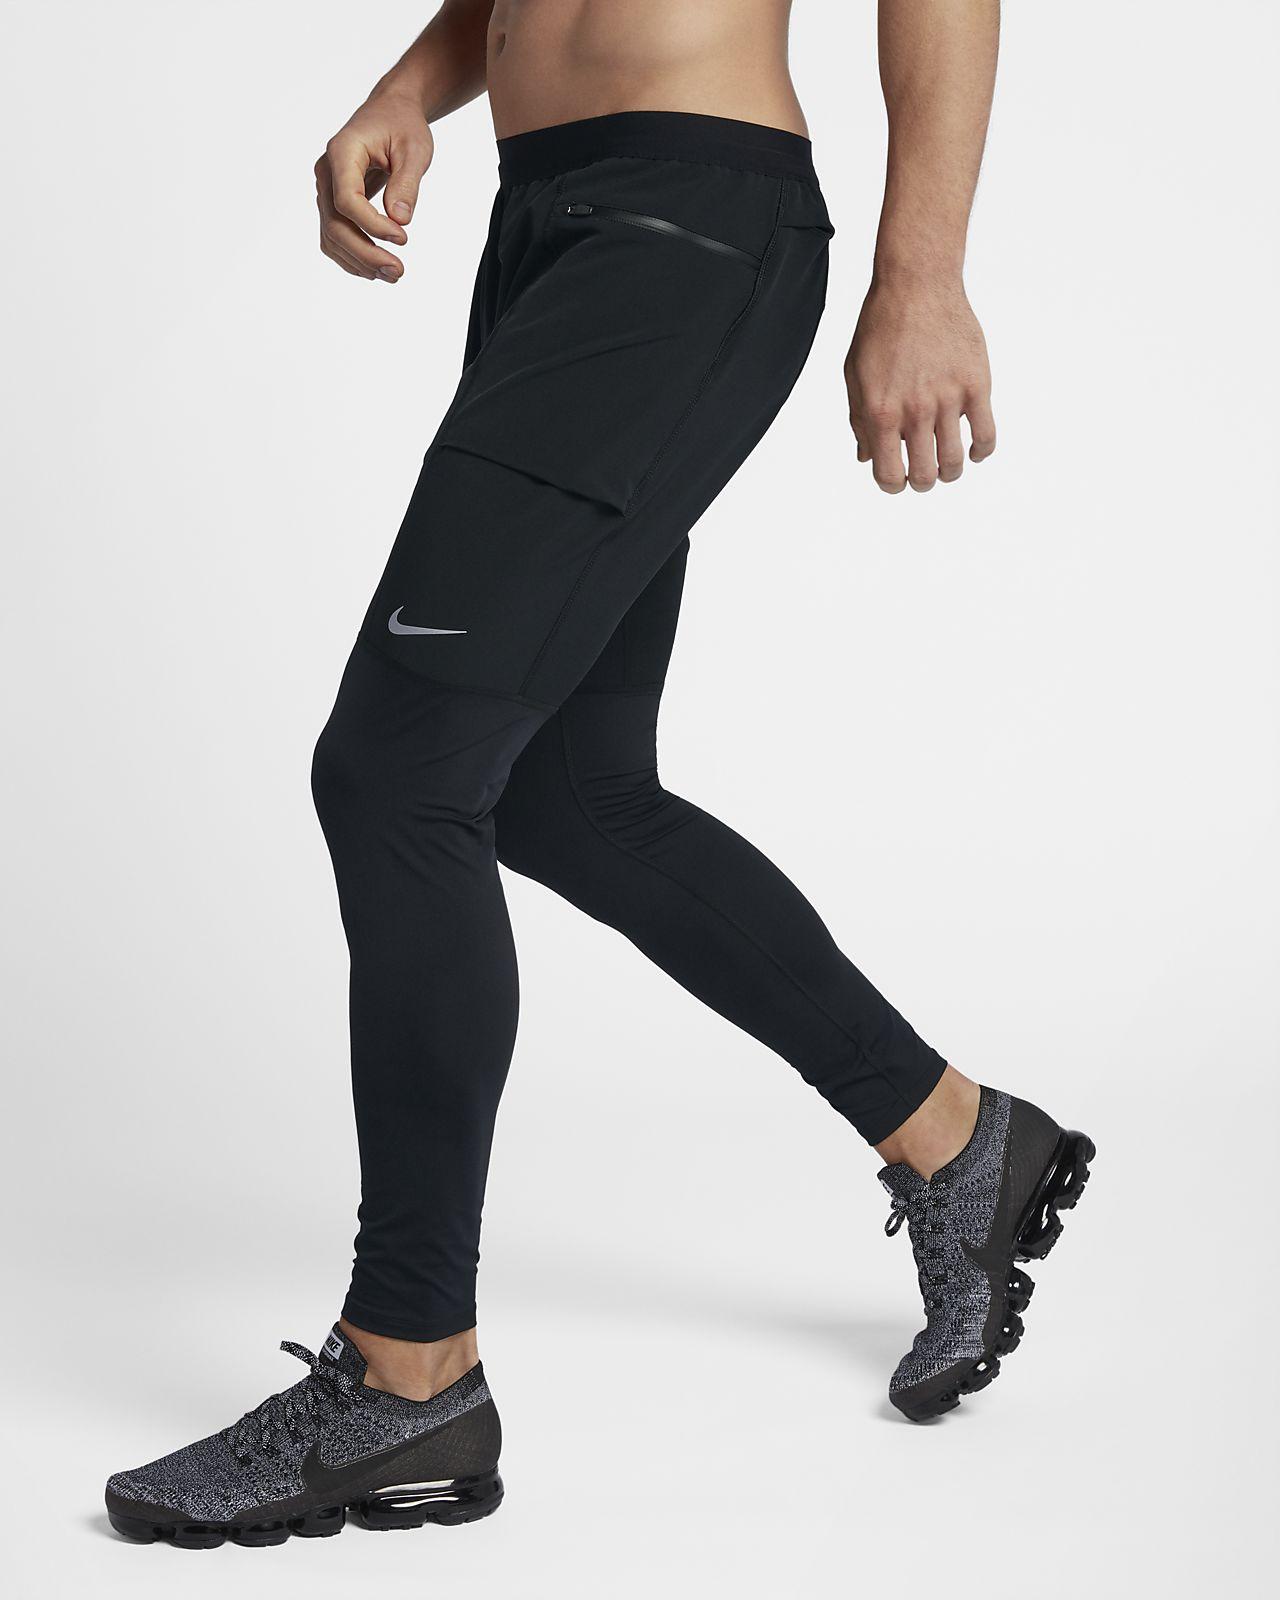 Low Resolution Nike Utility Men's Running Trousers Nike Utility Men's  Running Trousers